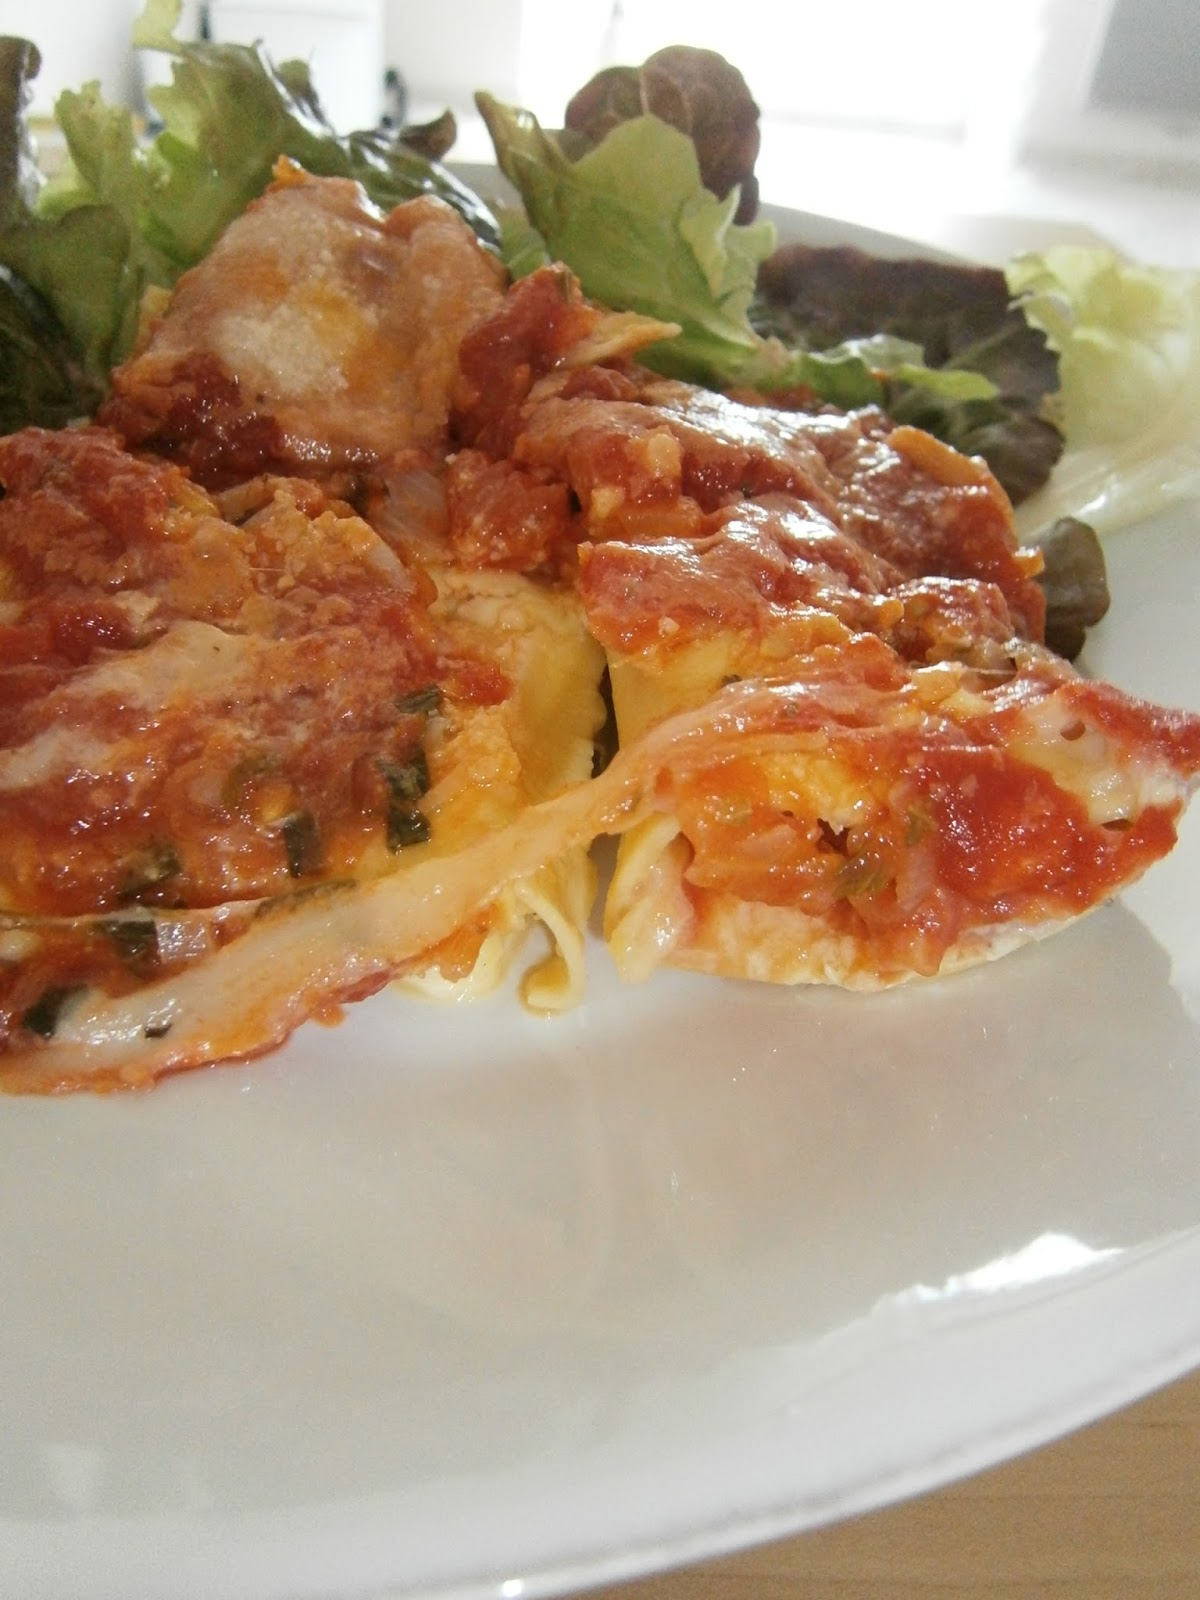 d lices d 39 une novice cannelloni mozzarella et jambon cru sauce tomate basilic. Black Bedroom Furniture Sets. Home Design Ideas